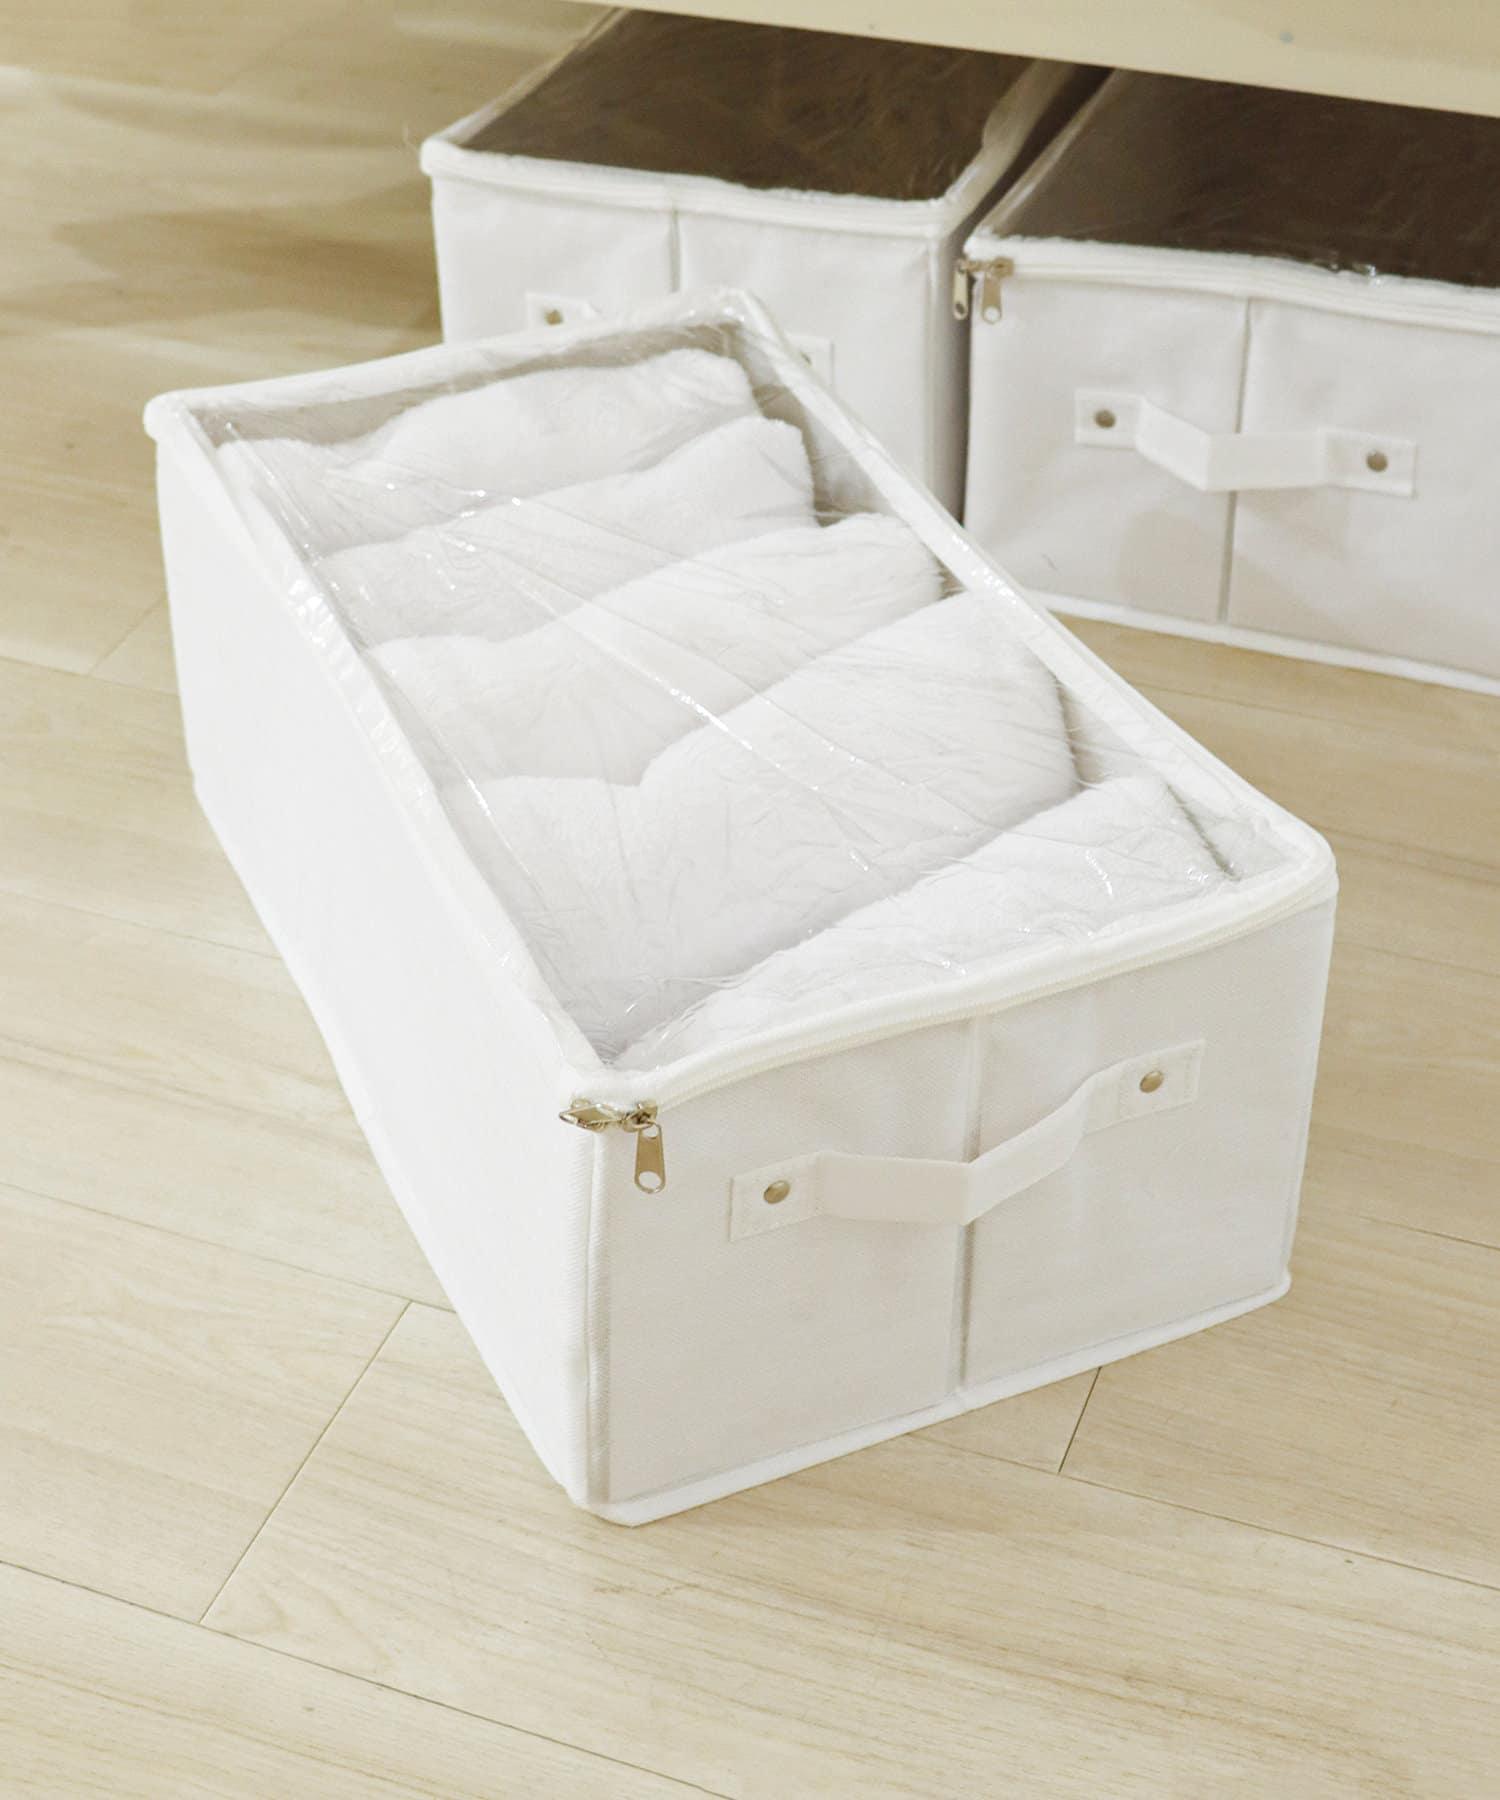 3COINS(スリーコインズ) ライフスタイル 透明フタ付収納ボックス ホワイト